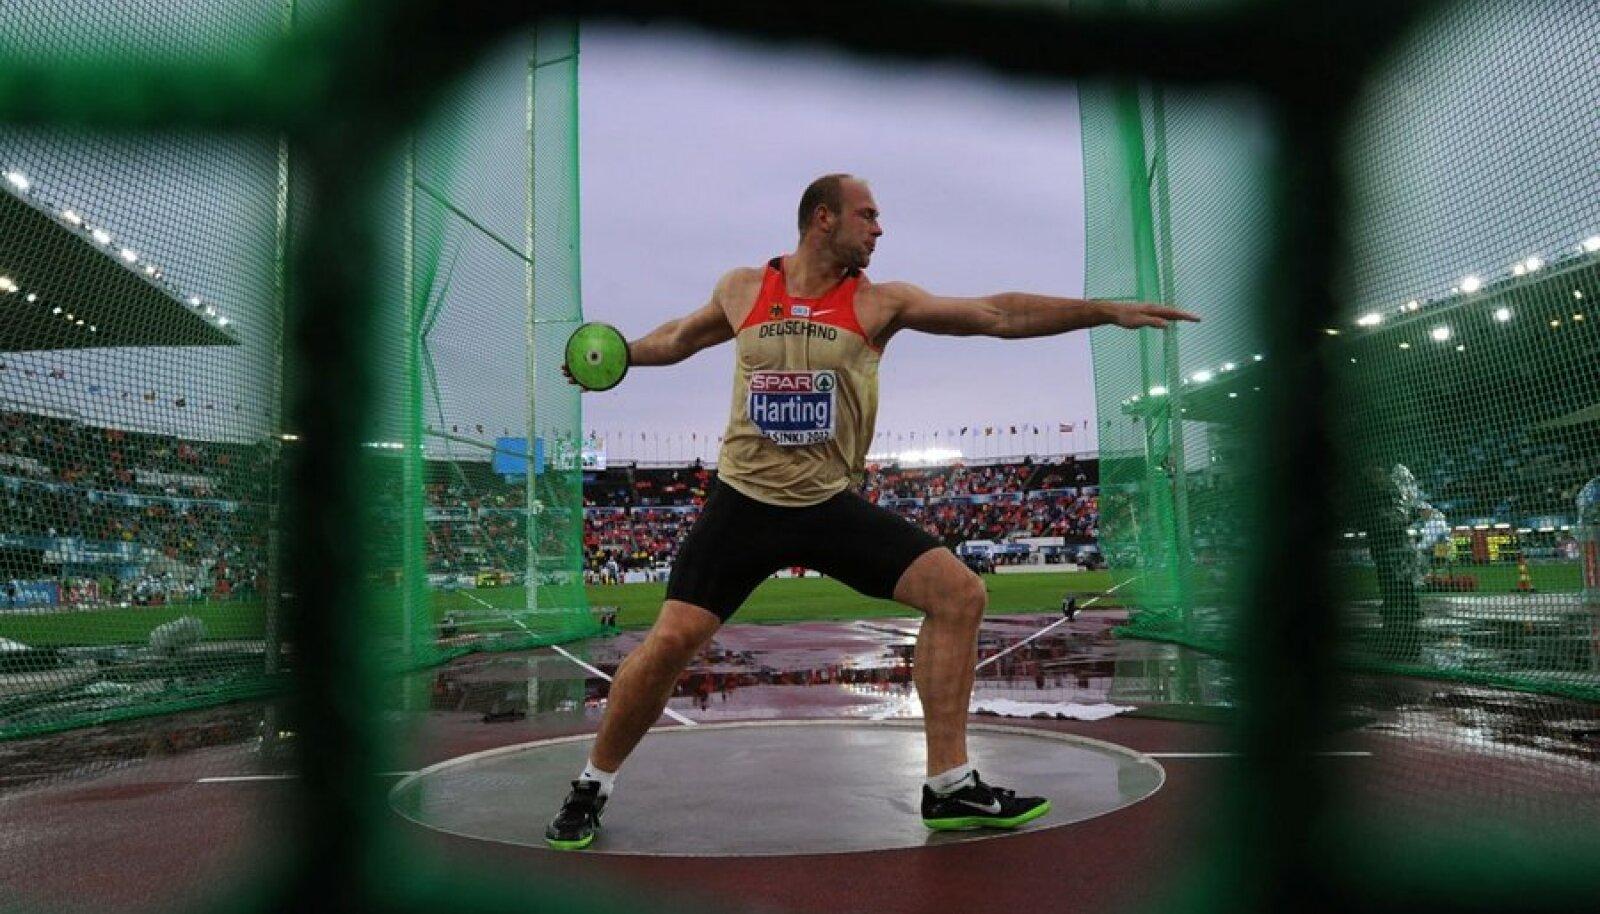 Robert Harting: kas muredest painatud mees või spordimaailma peen intrigant? Foto: AFP/Scanpix